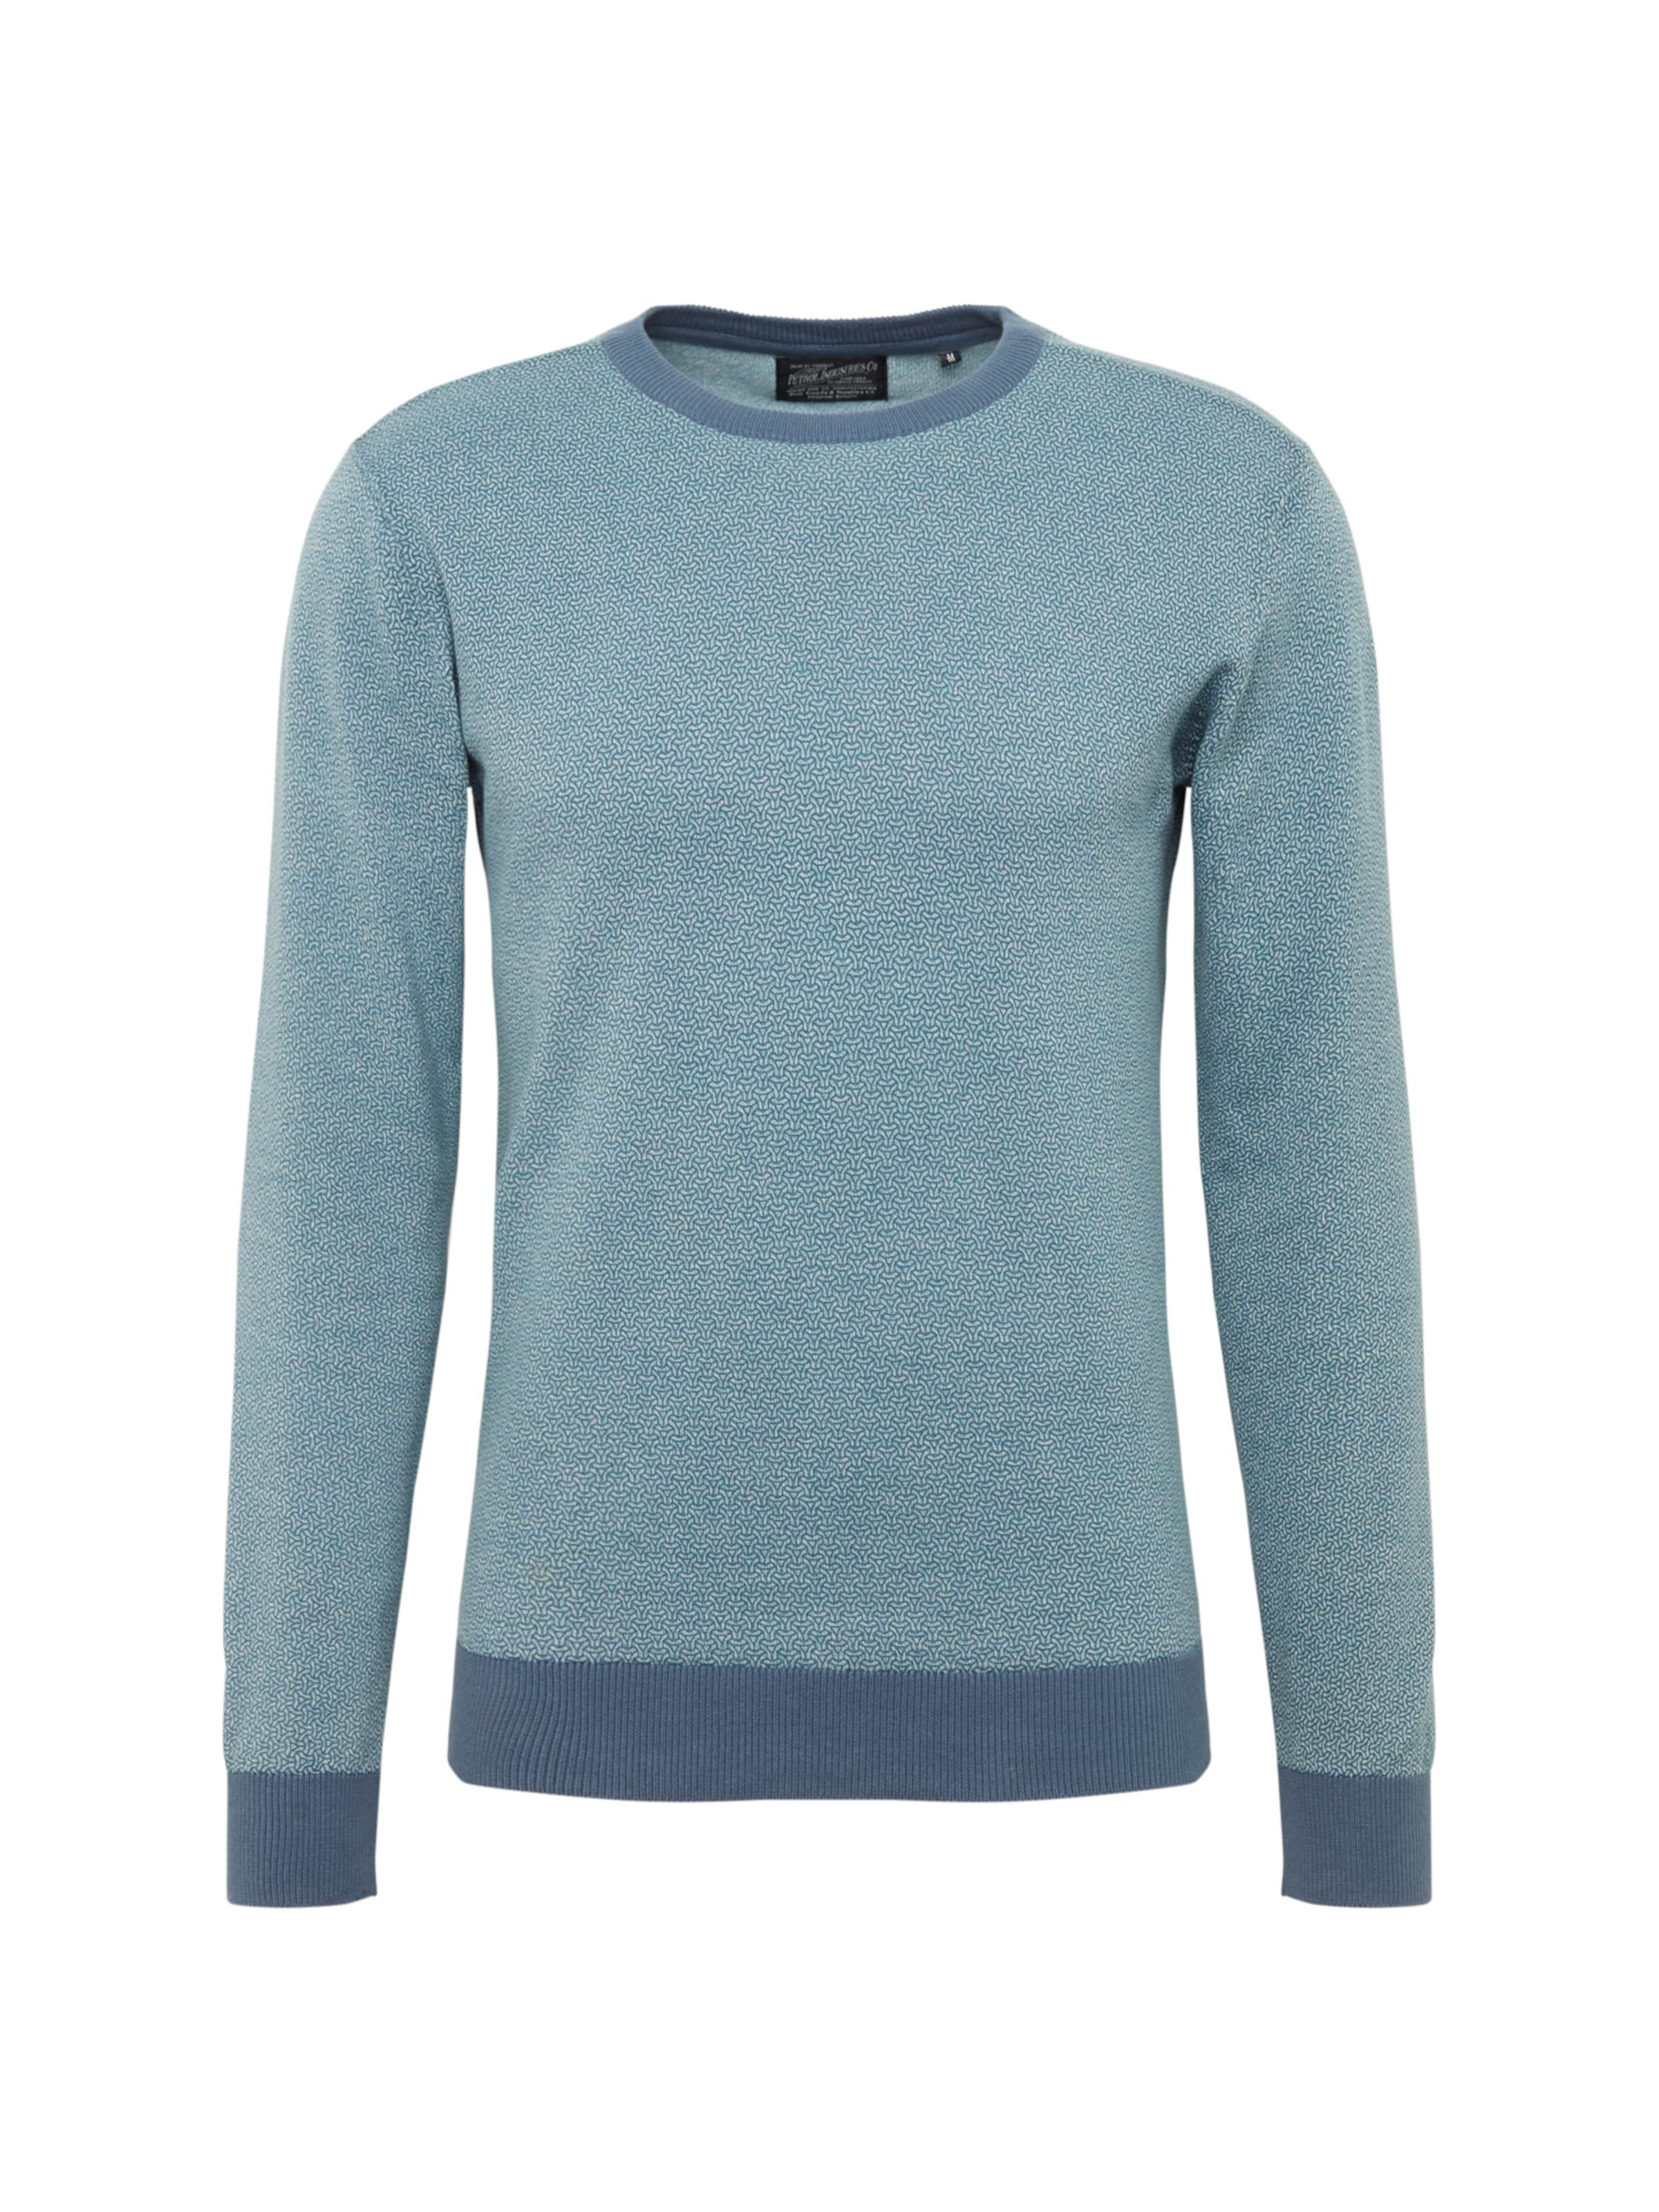 VertClair Petrol En Industries Sweat shirt 7Yfvmb6yIg